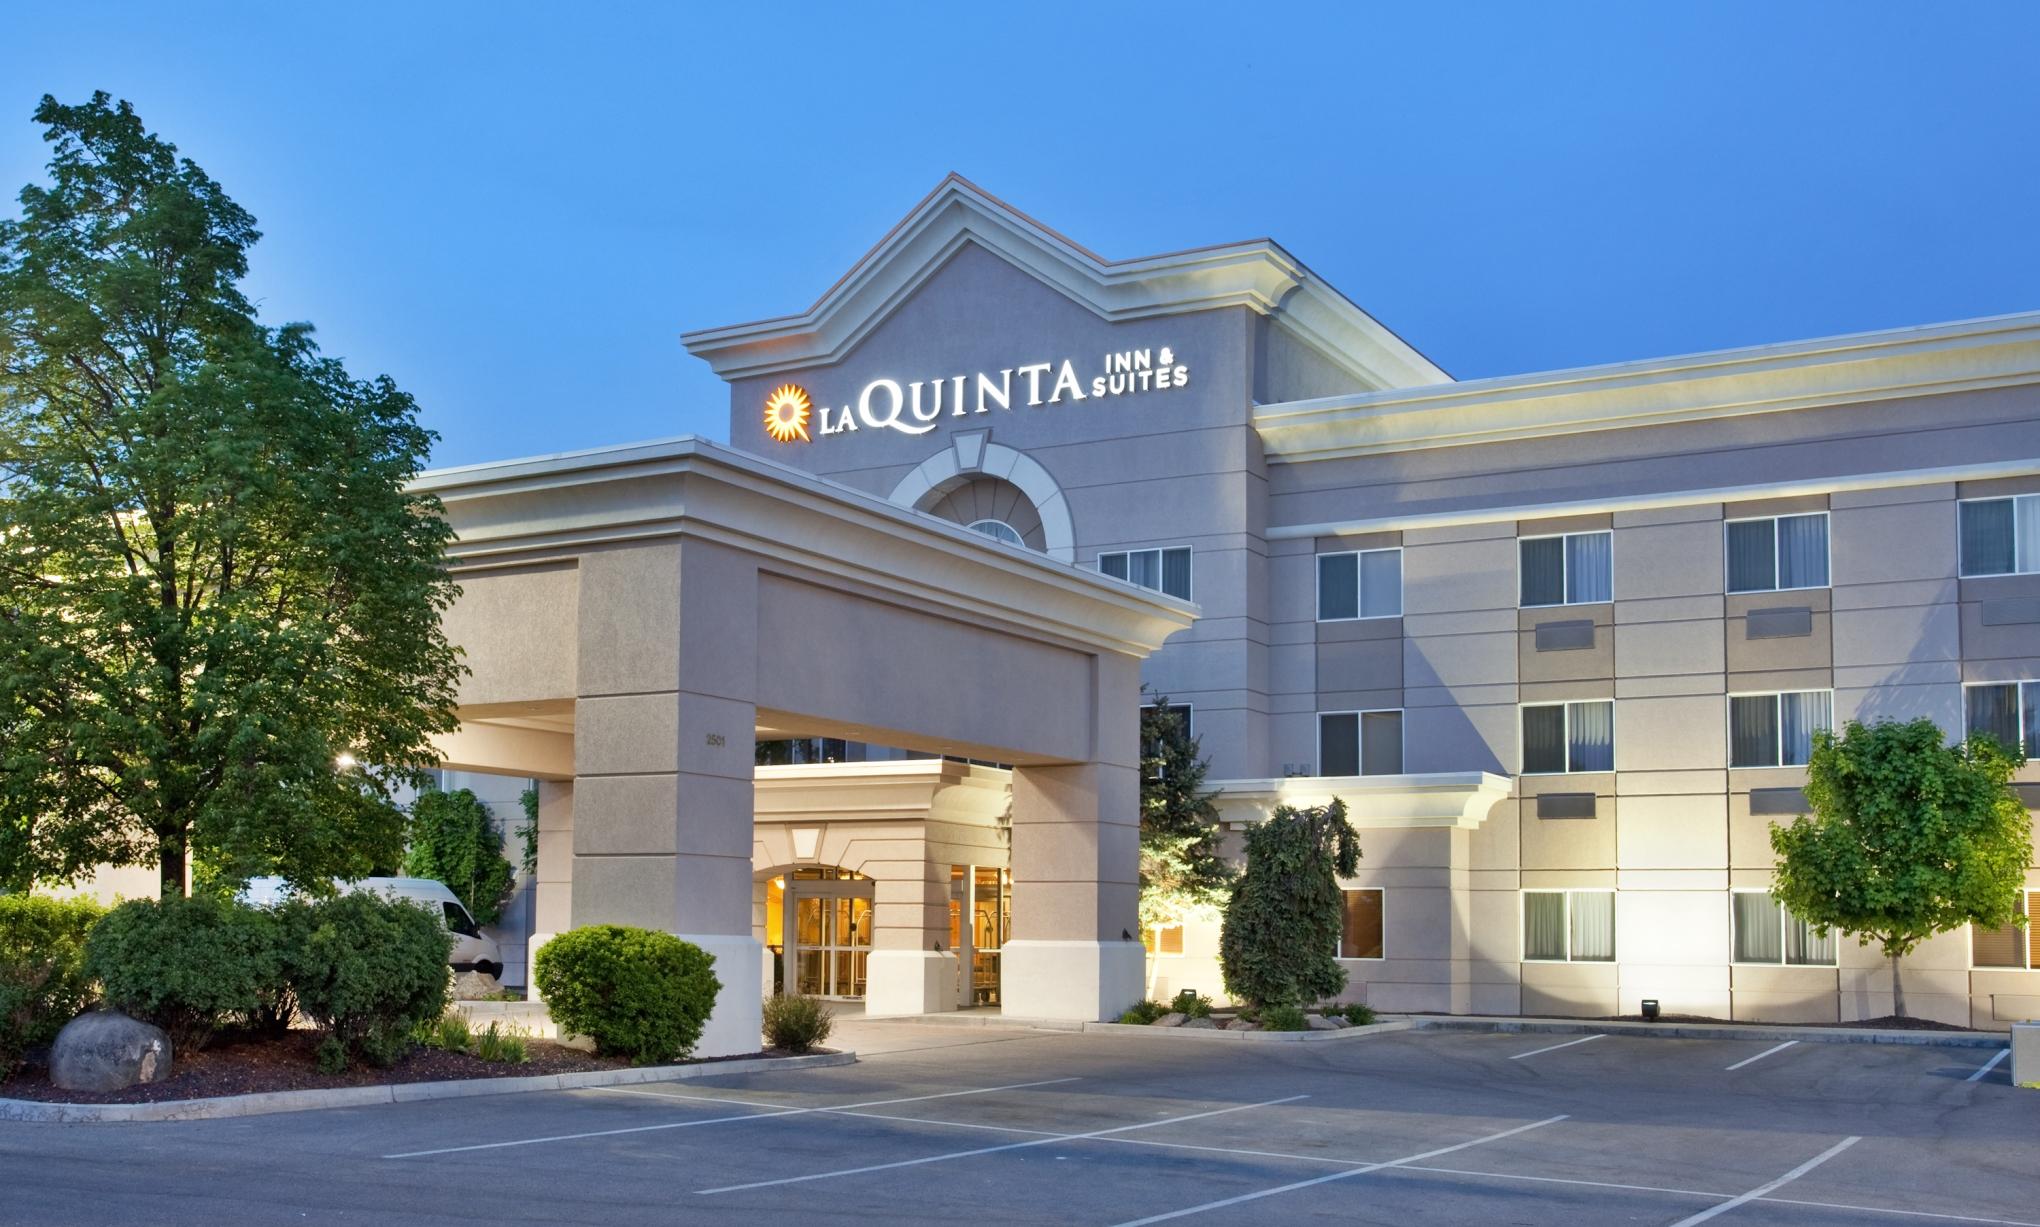 La Quinta Inn Amp Suites Idaho Falls Inntrusted